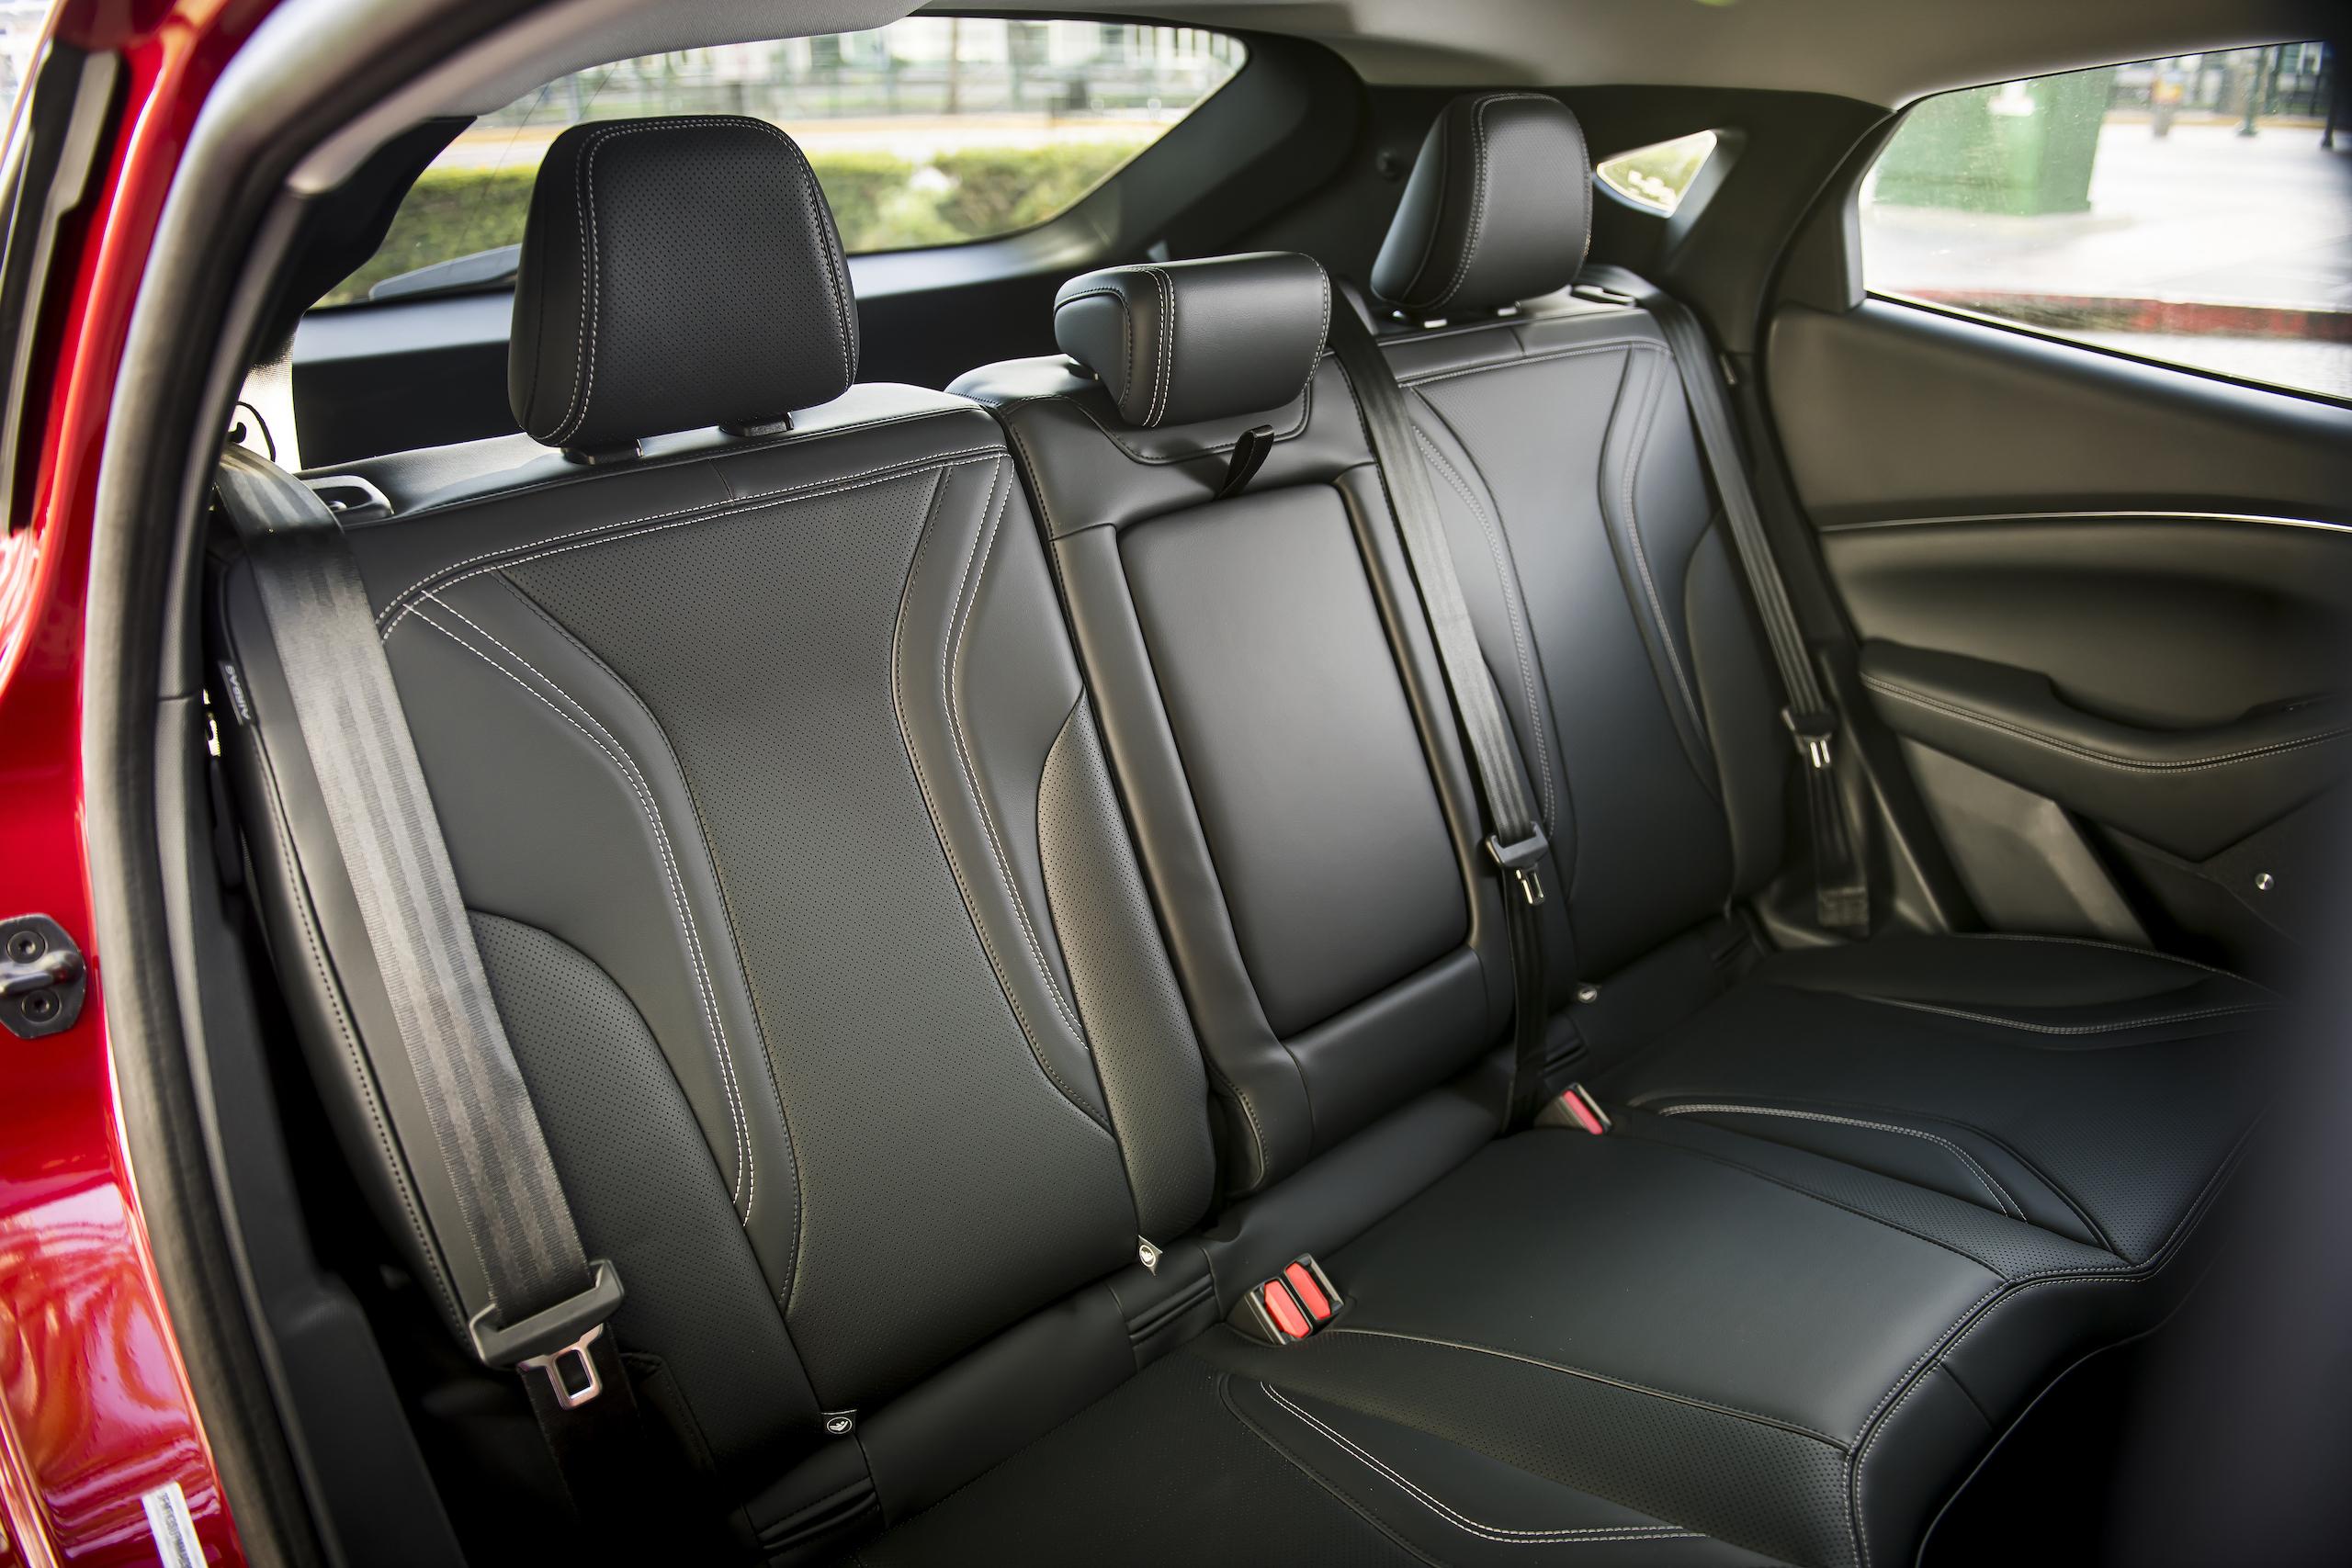 Mustang Mach-E interior rear seat